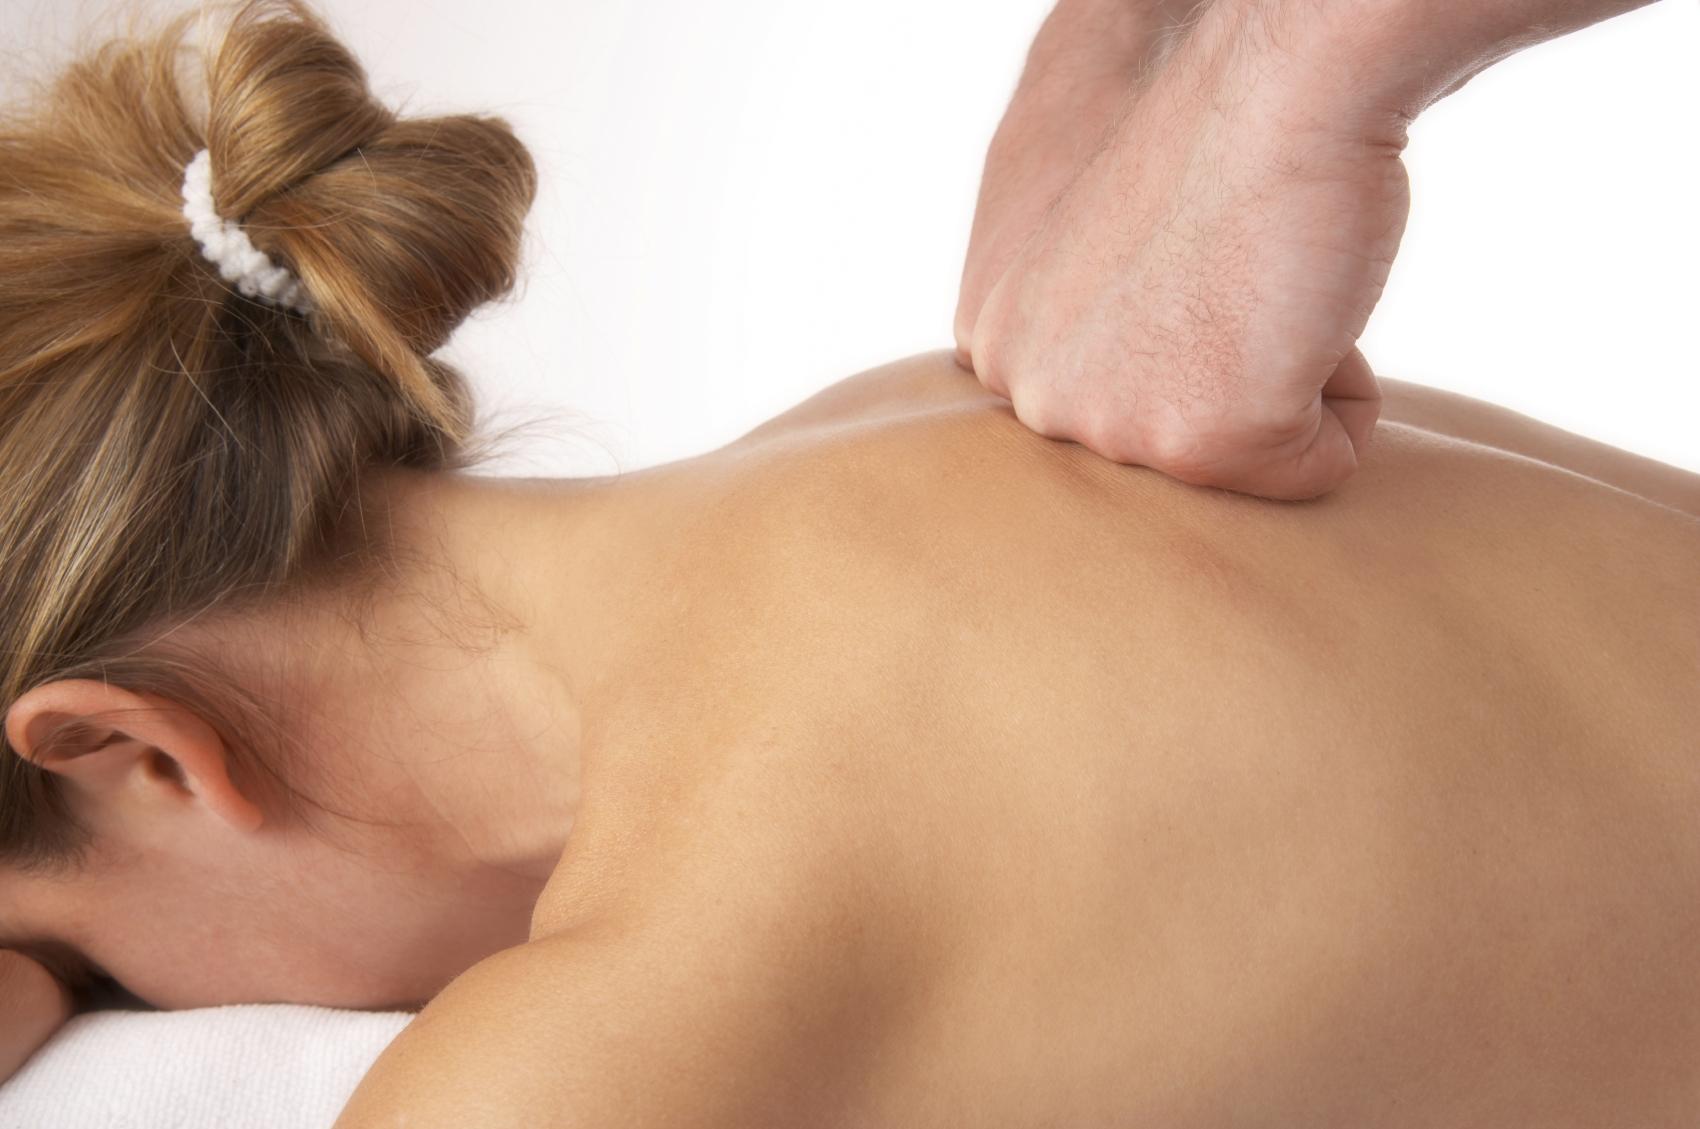 sports-massage%20%281%29.jpg?1454246237